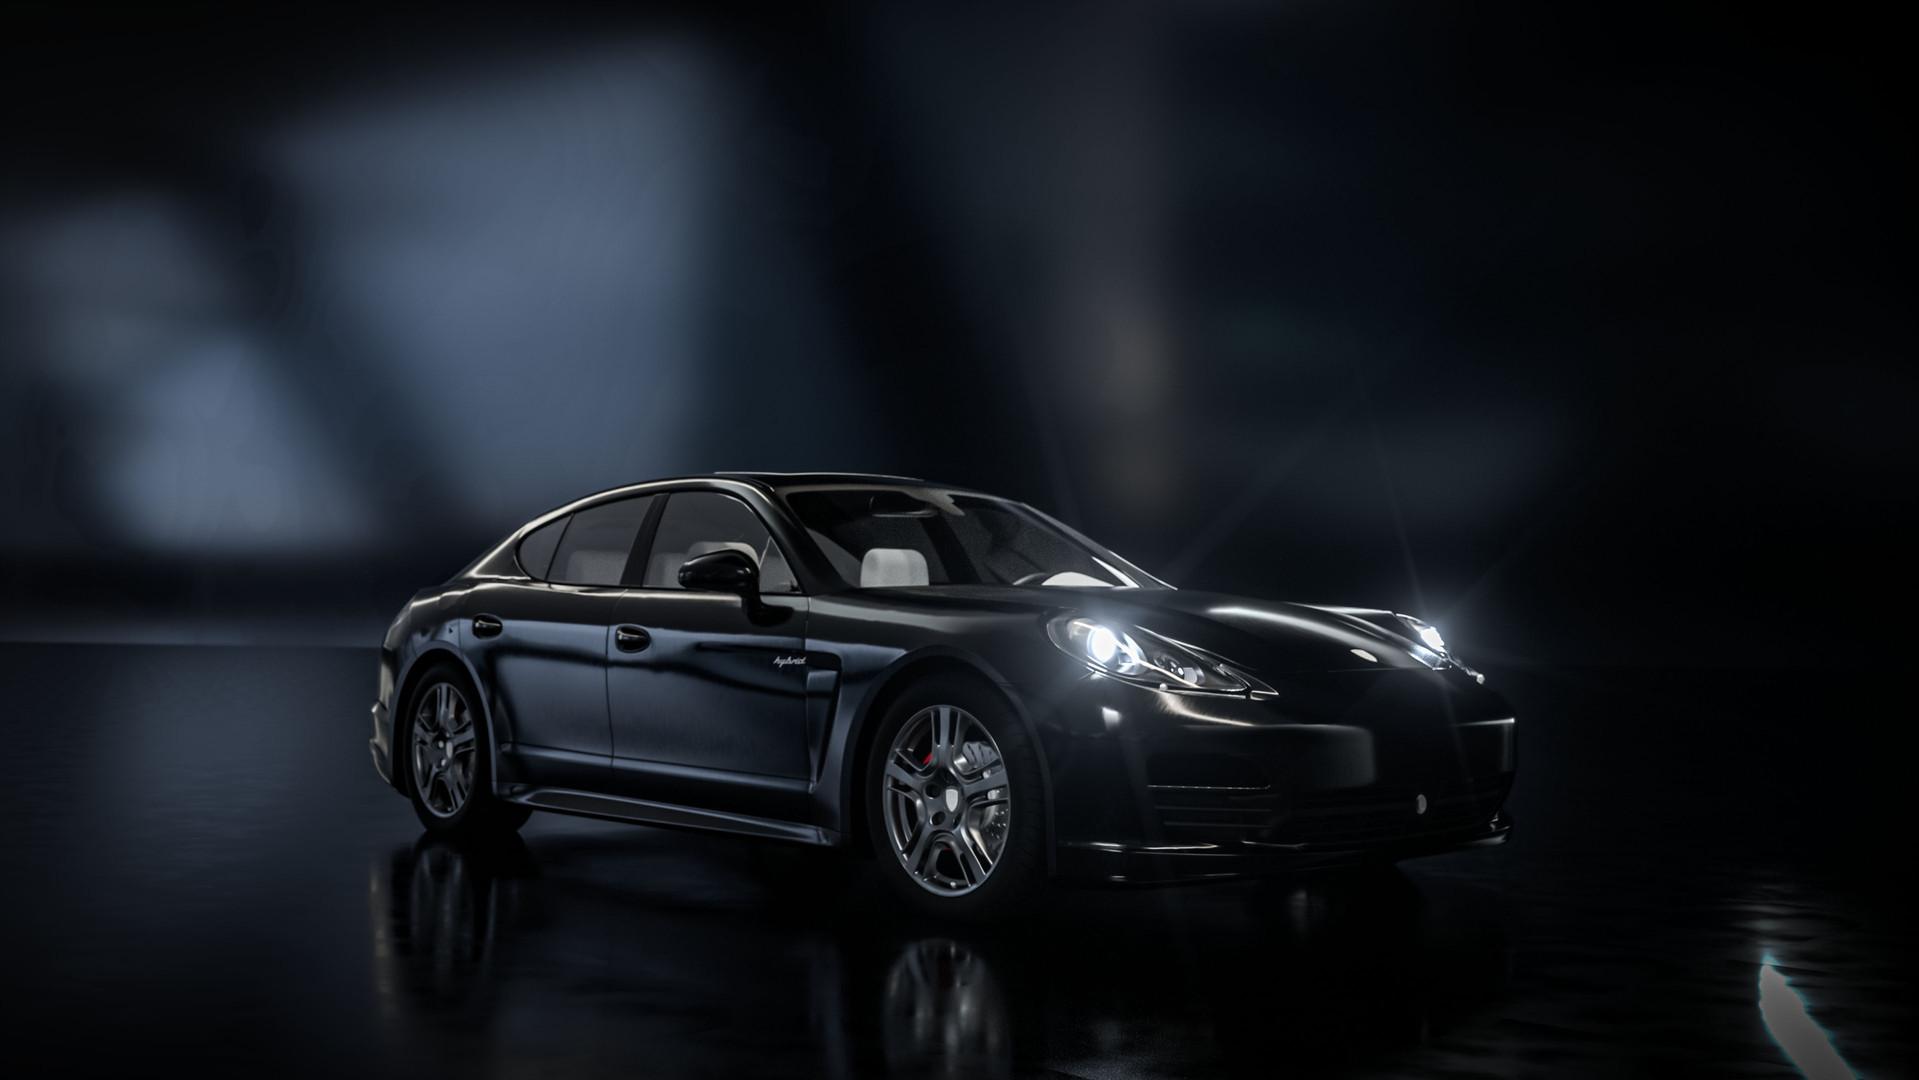 Porsche Panamera Nacht 3D Animation Teuf